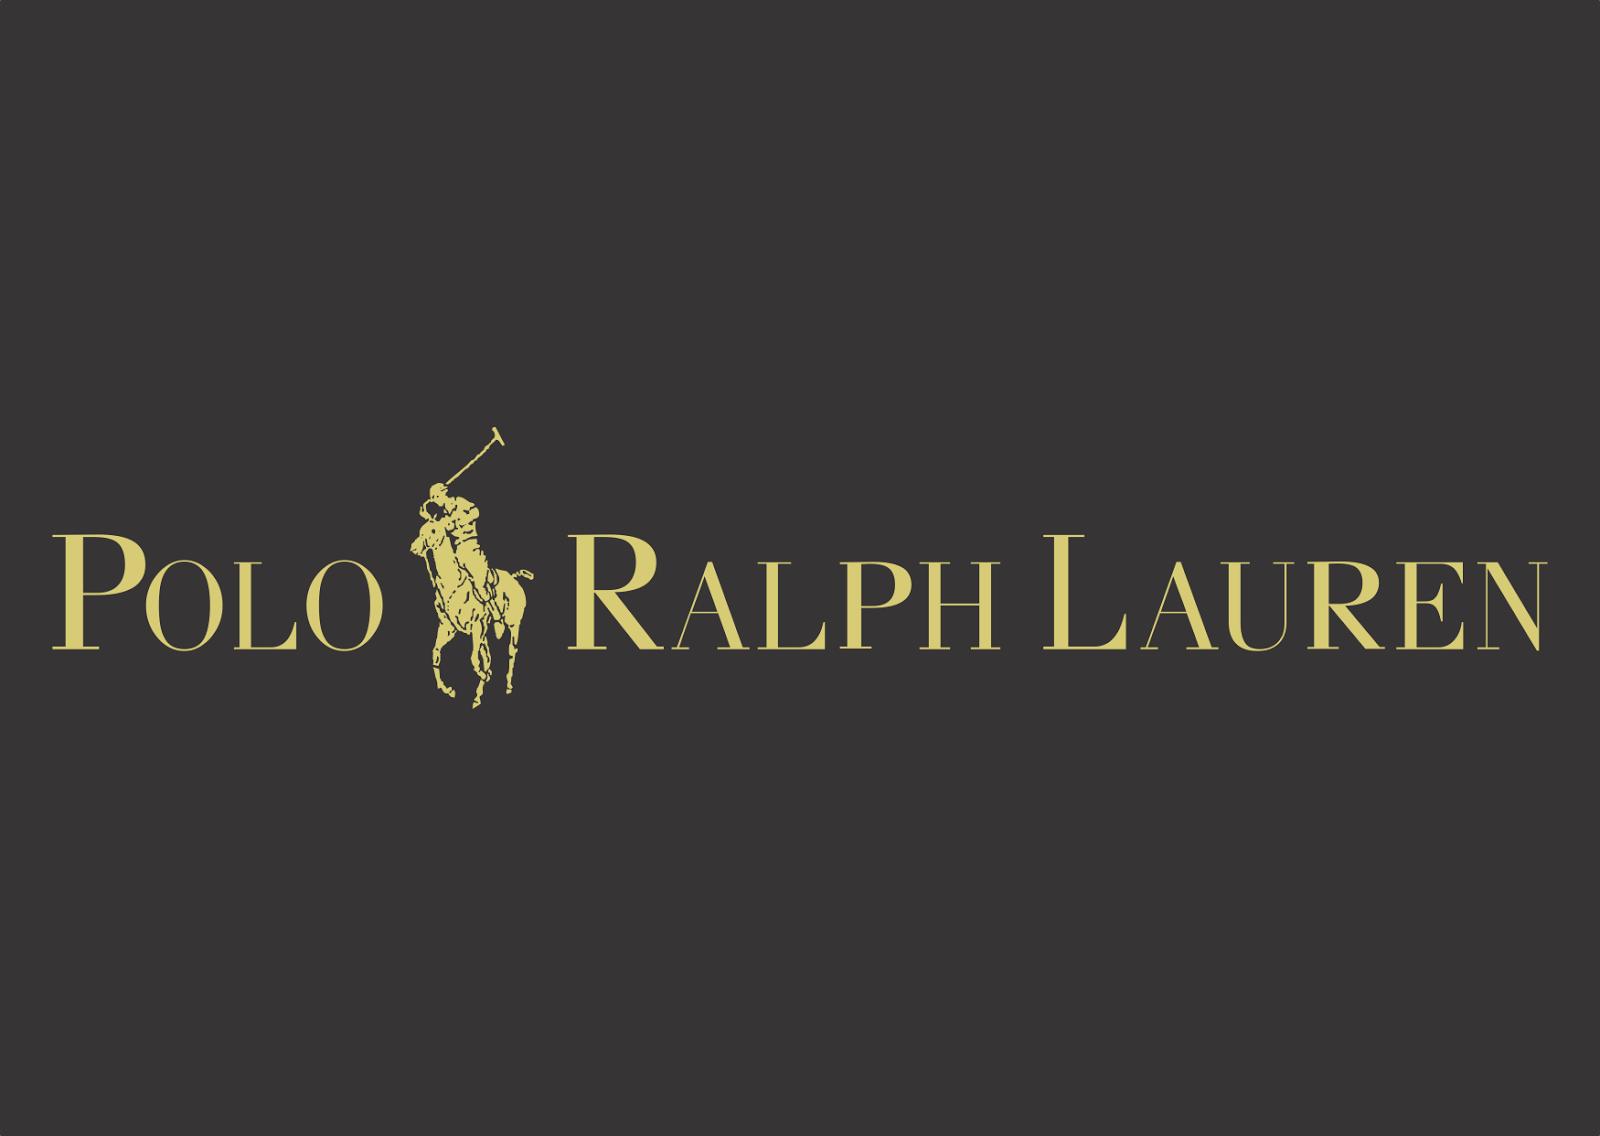 Polo Ralph Lauren Logo Wallpapers Wallpaper Cave